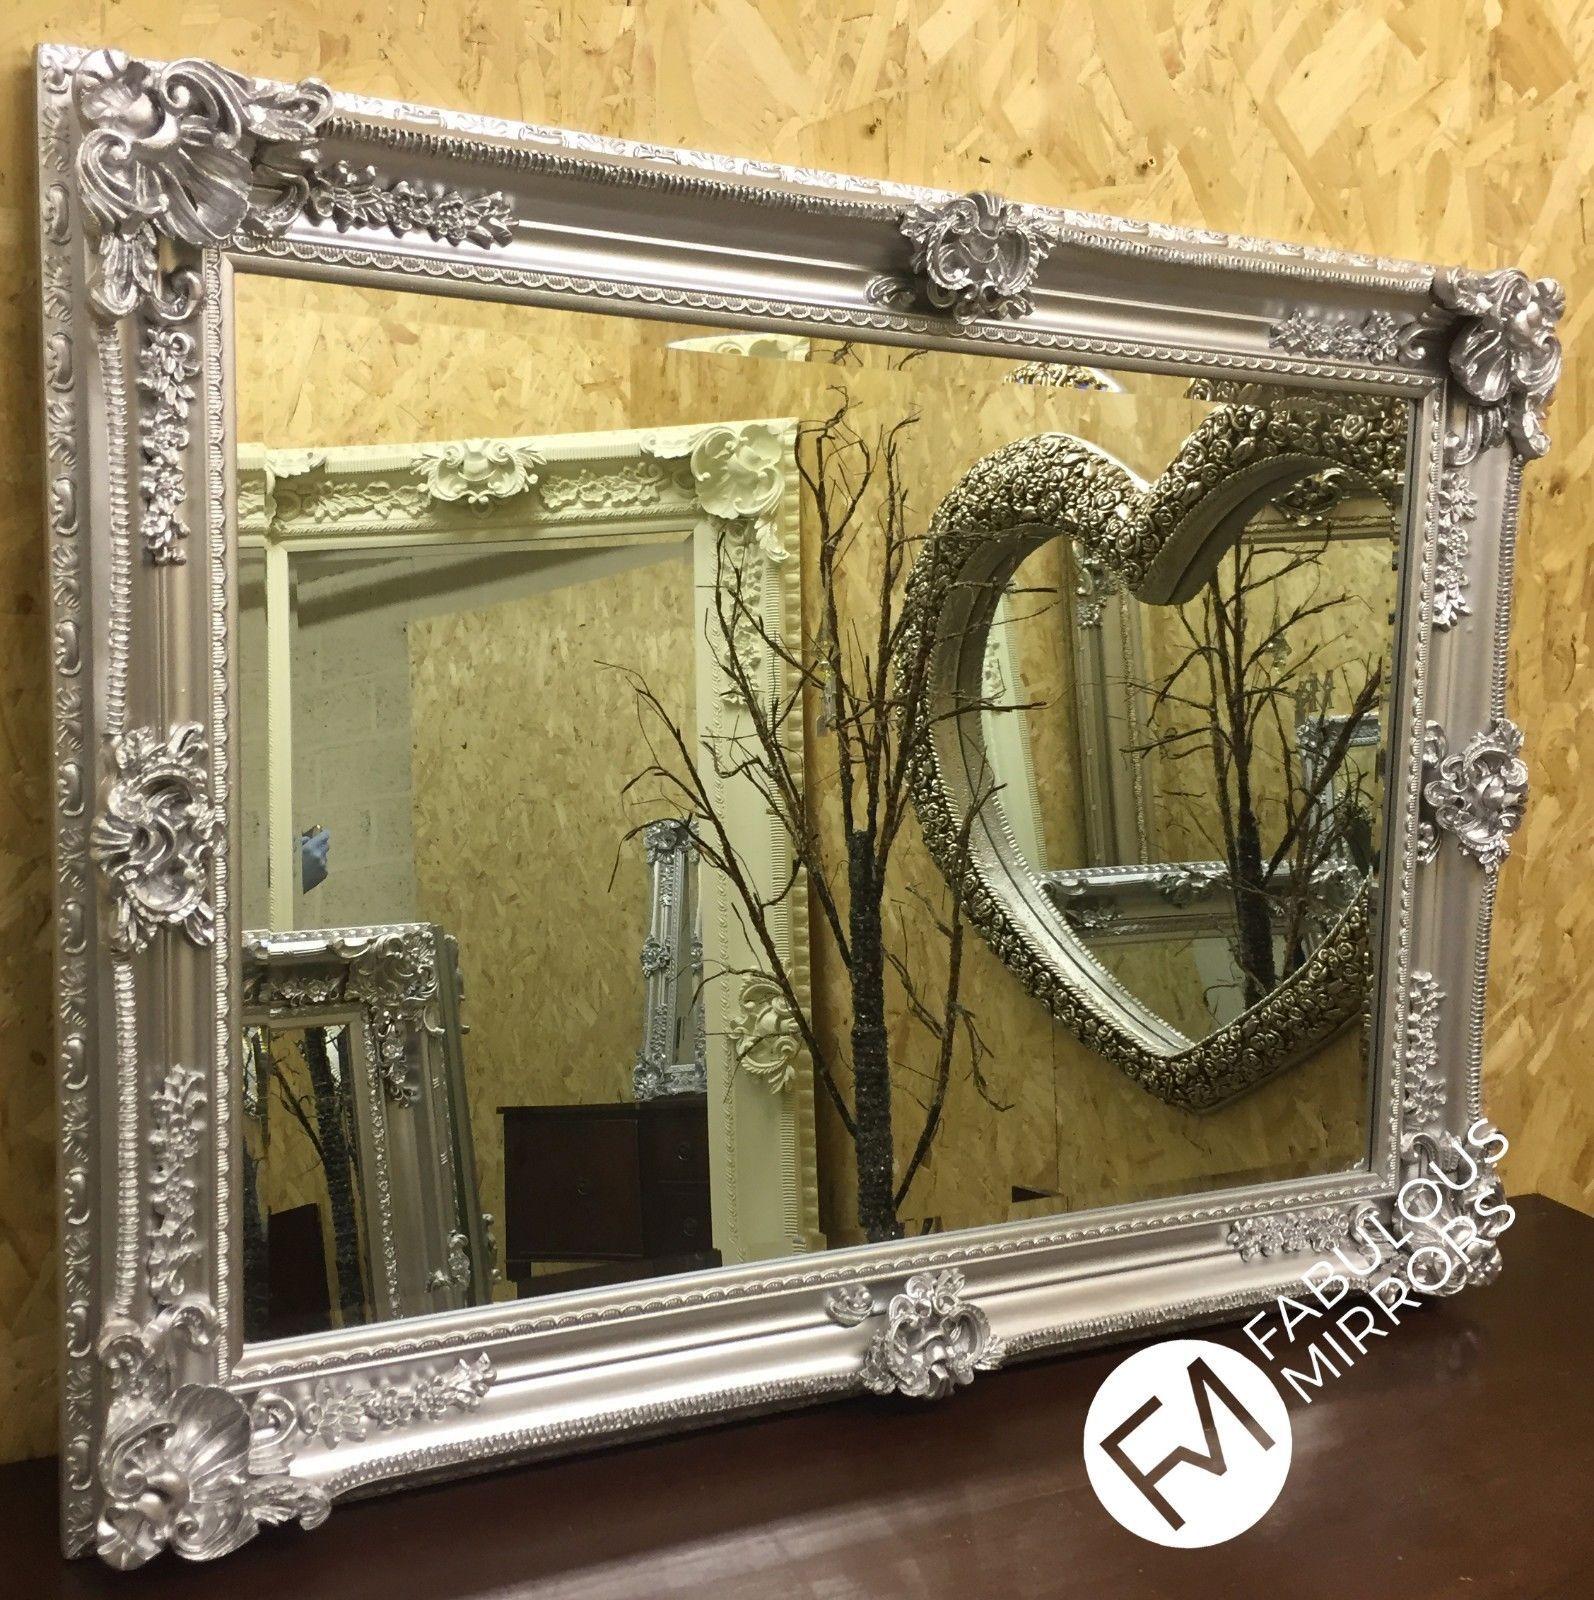 Lg Bright Silver Chrome Ornate Decorative Wall Mirror Rrp 249 99 Sorrel